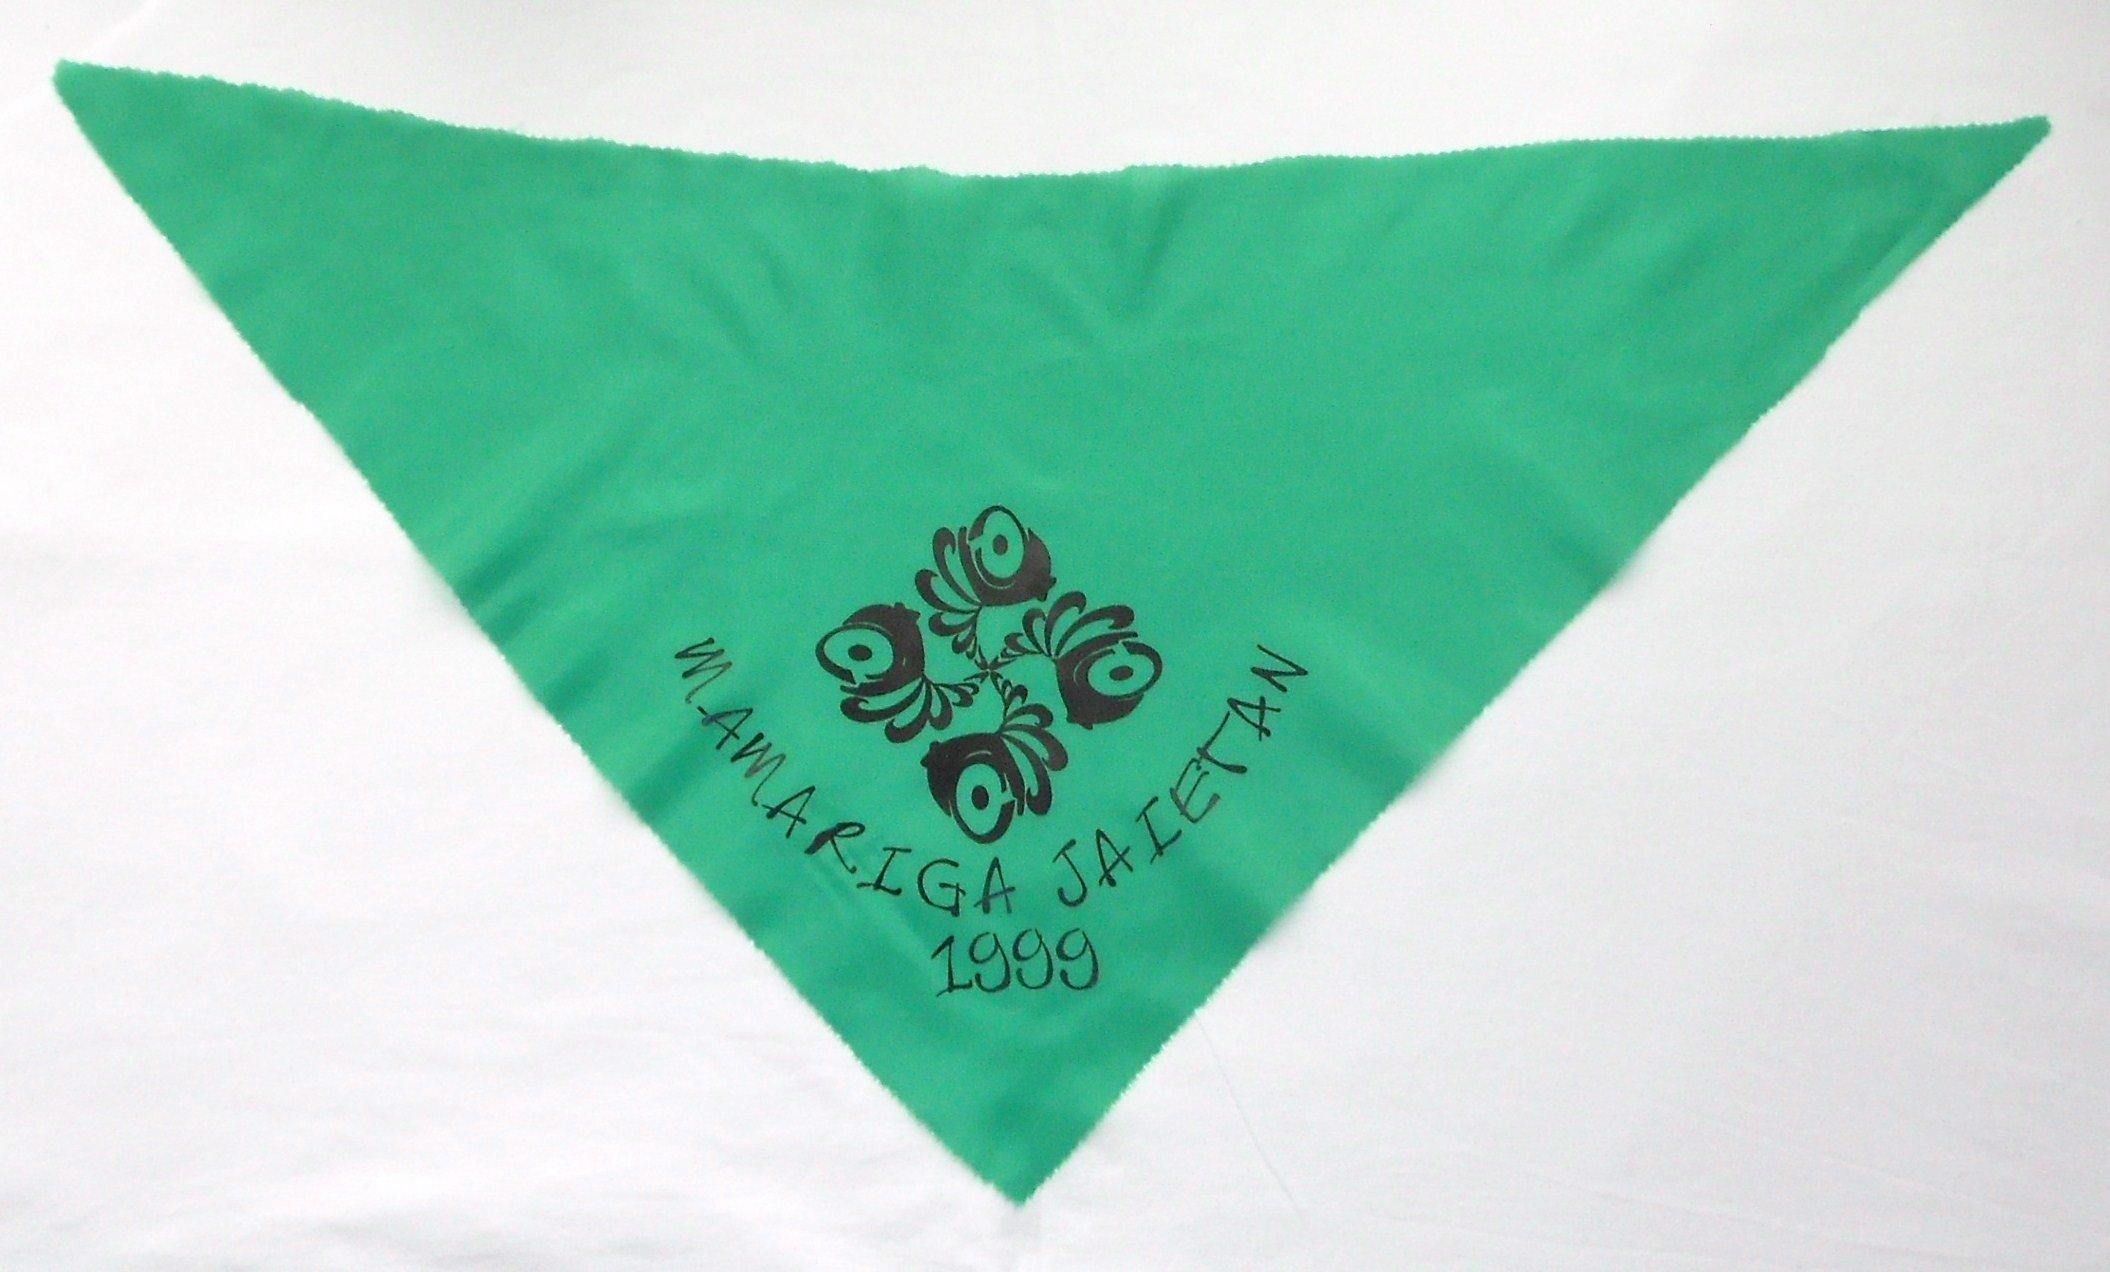 Pañuelo 1999 (1)